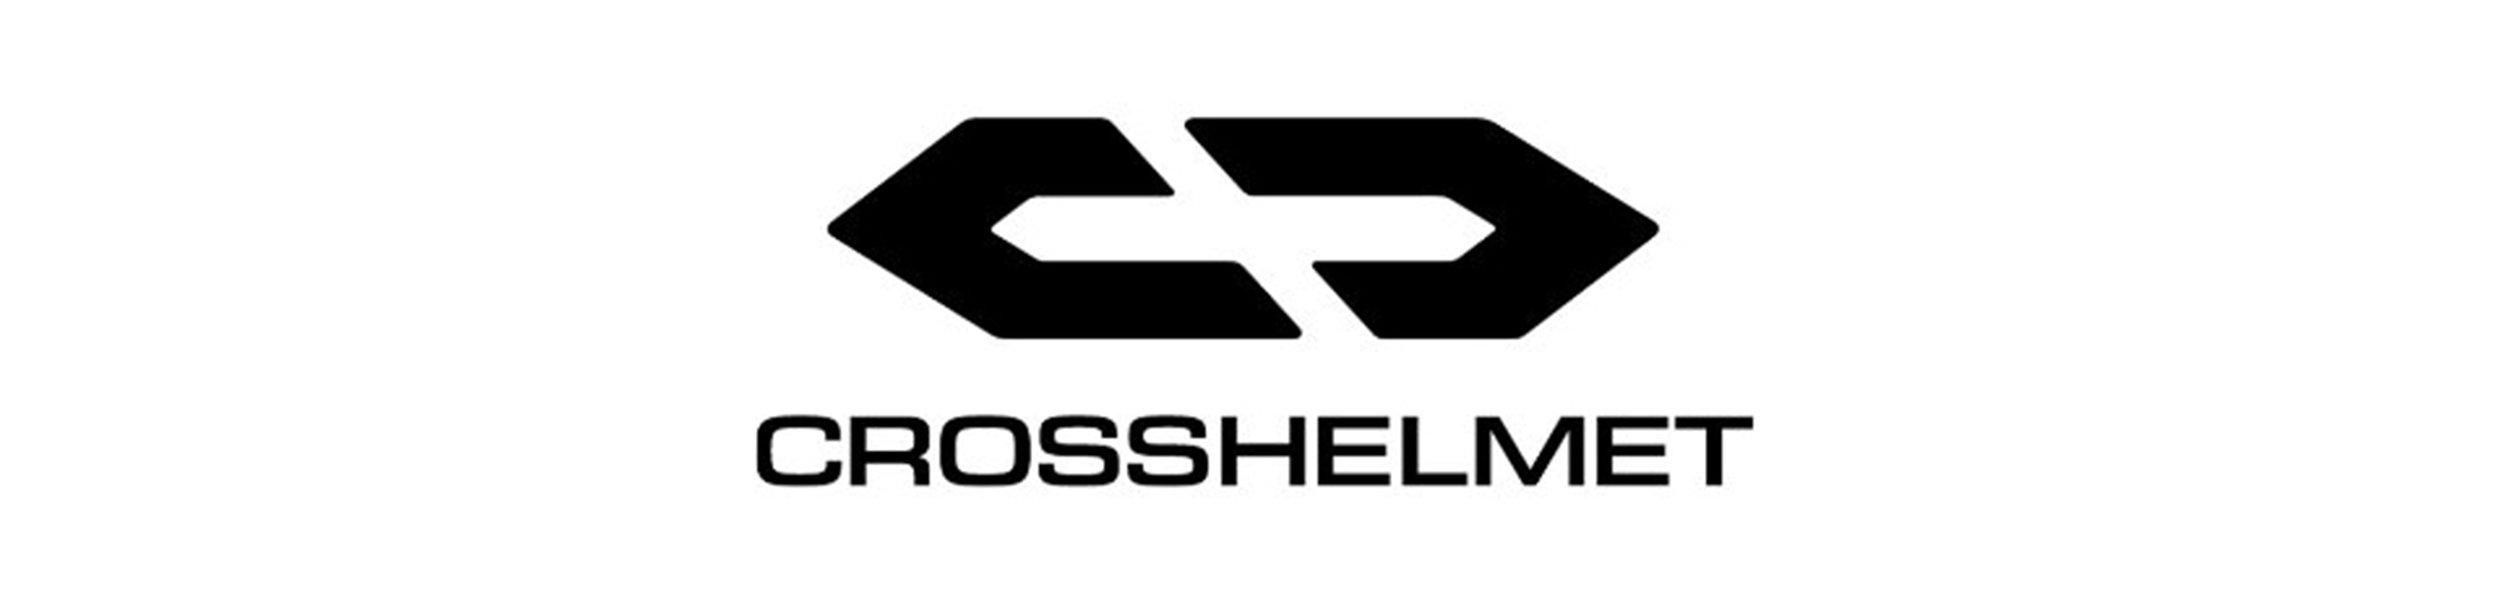 Developed original sound design for Cross Helmet promotional video.